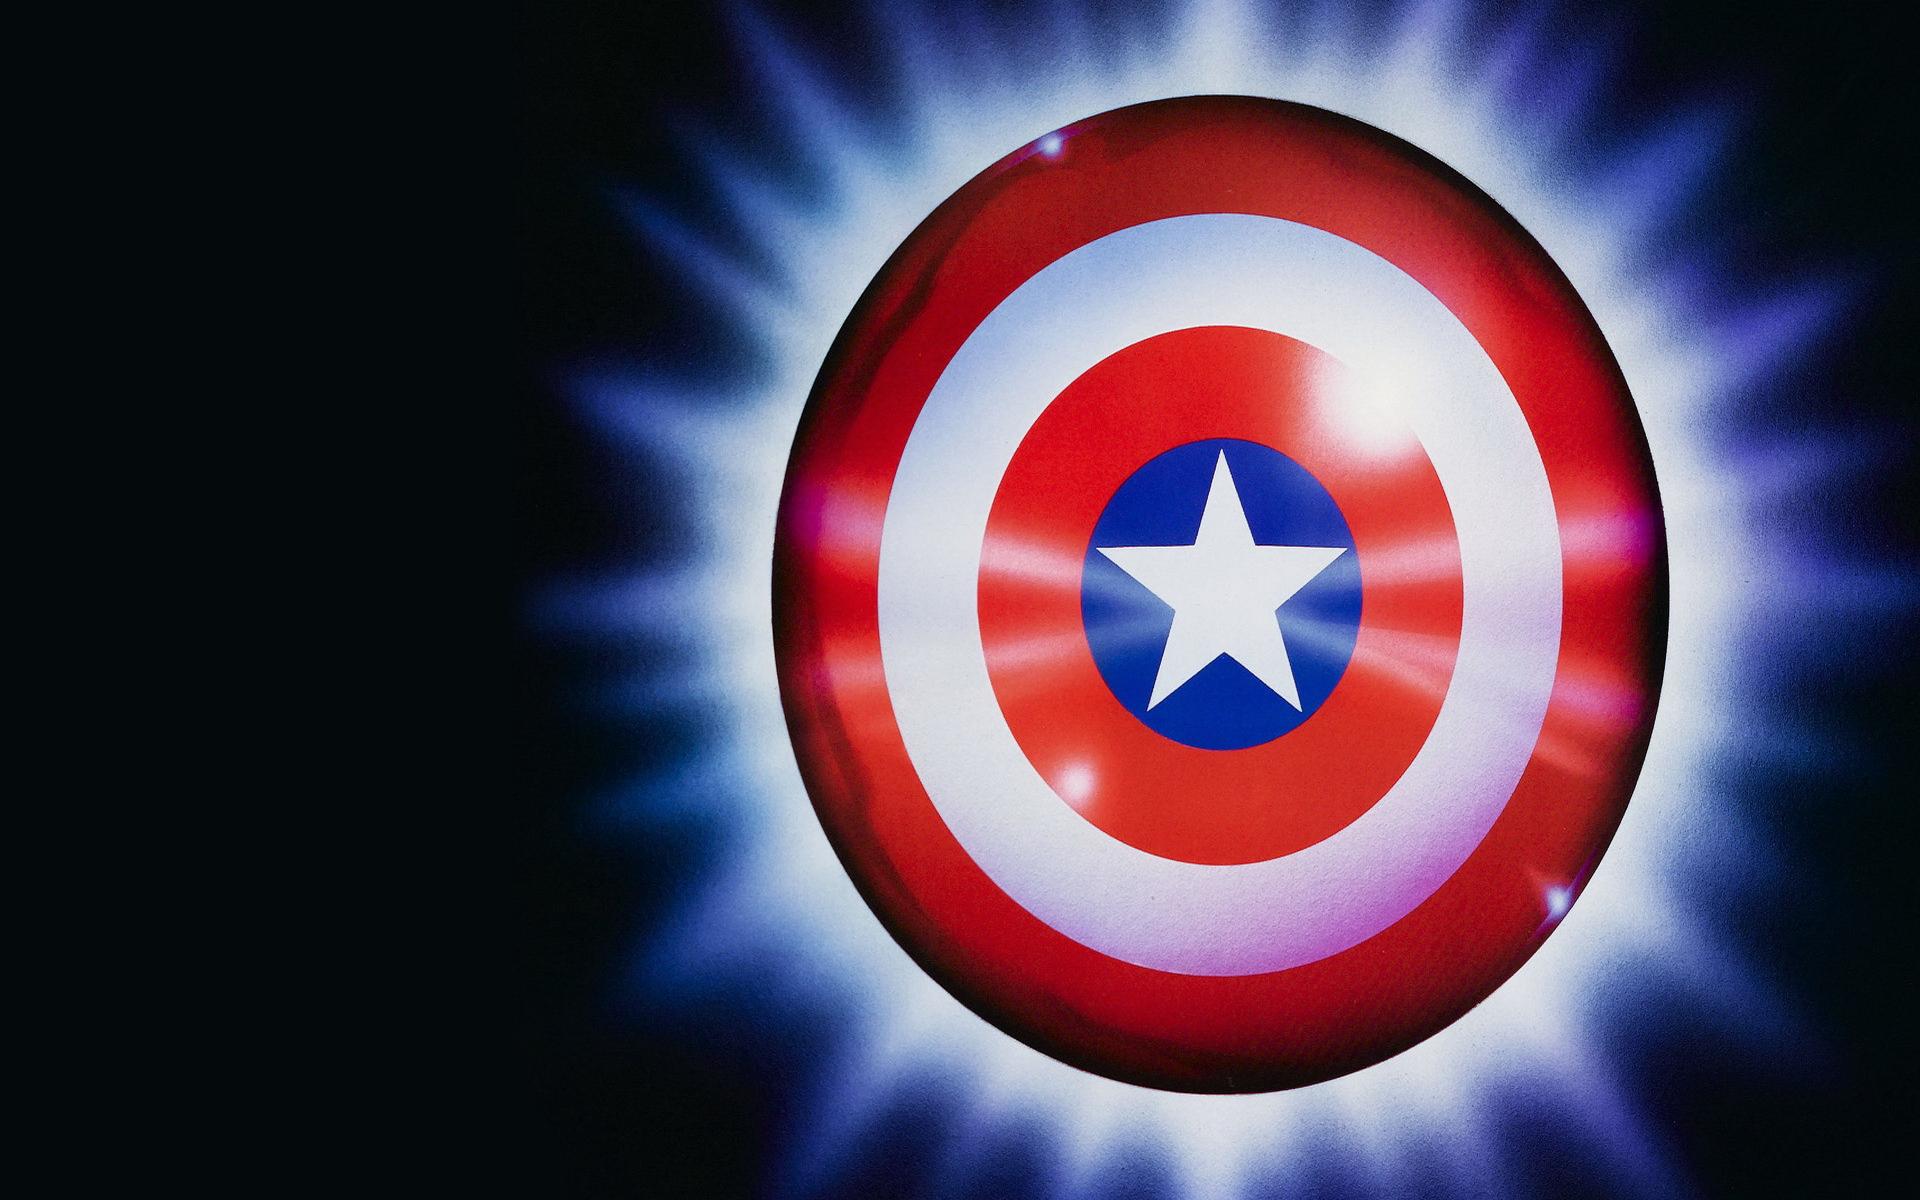 Captain America Wallpaper HD Desktop Wallpapers 1920x1200